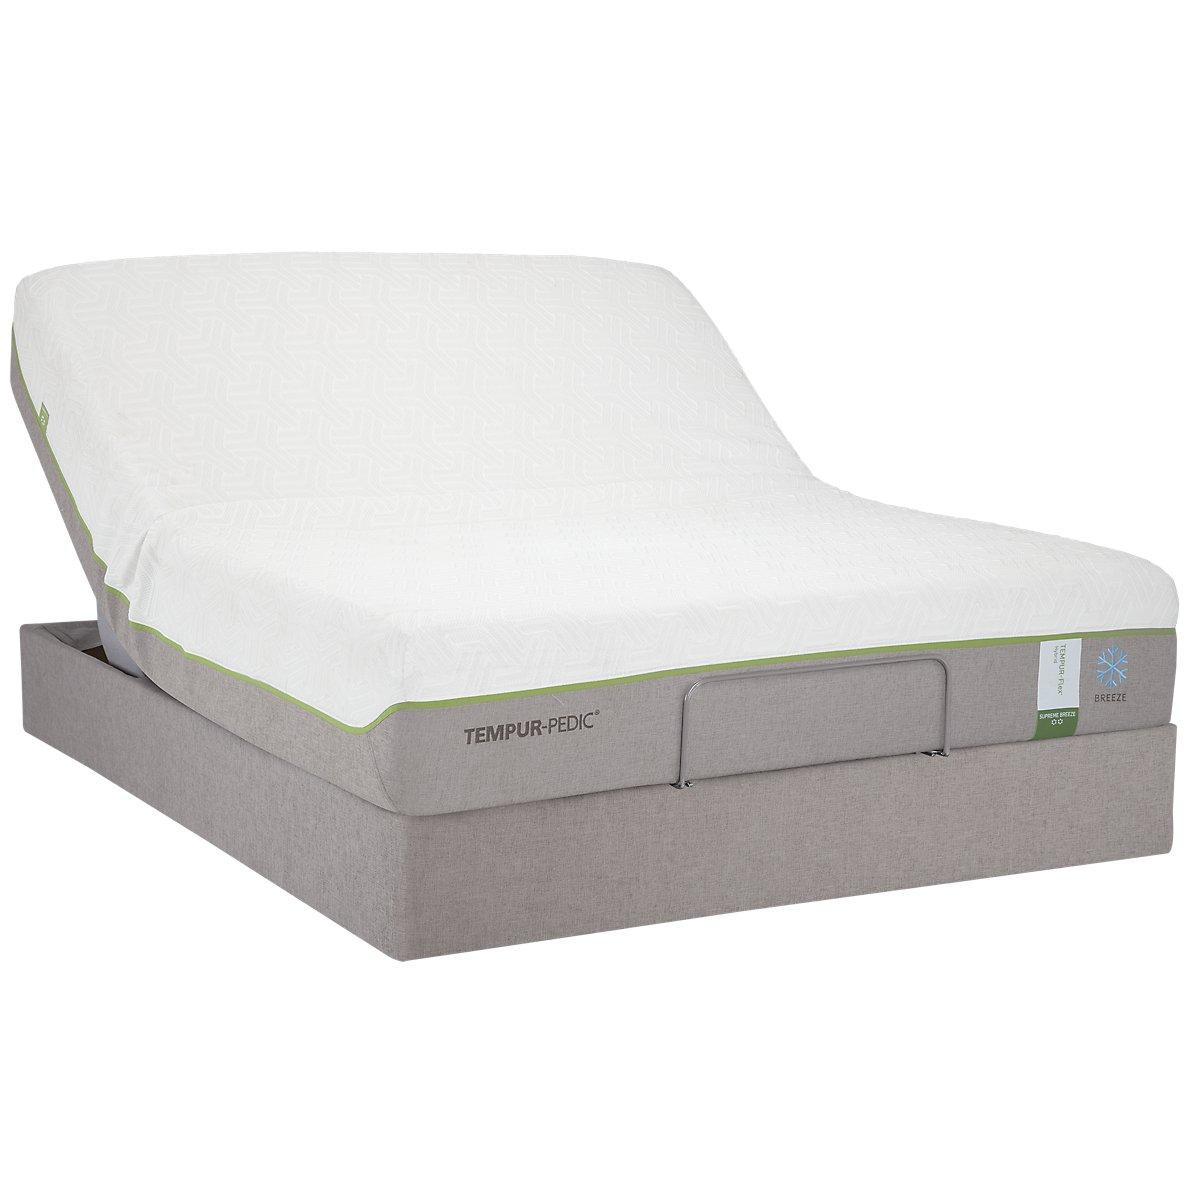 Adjustable Beds With Financing : City furniture flx sup bre tempur up adjustable mattress set